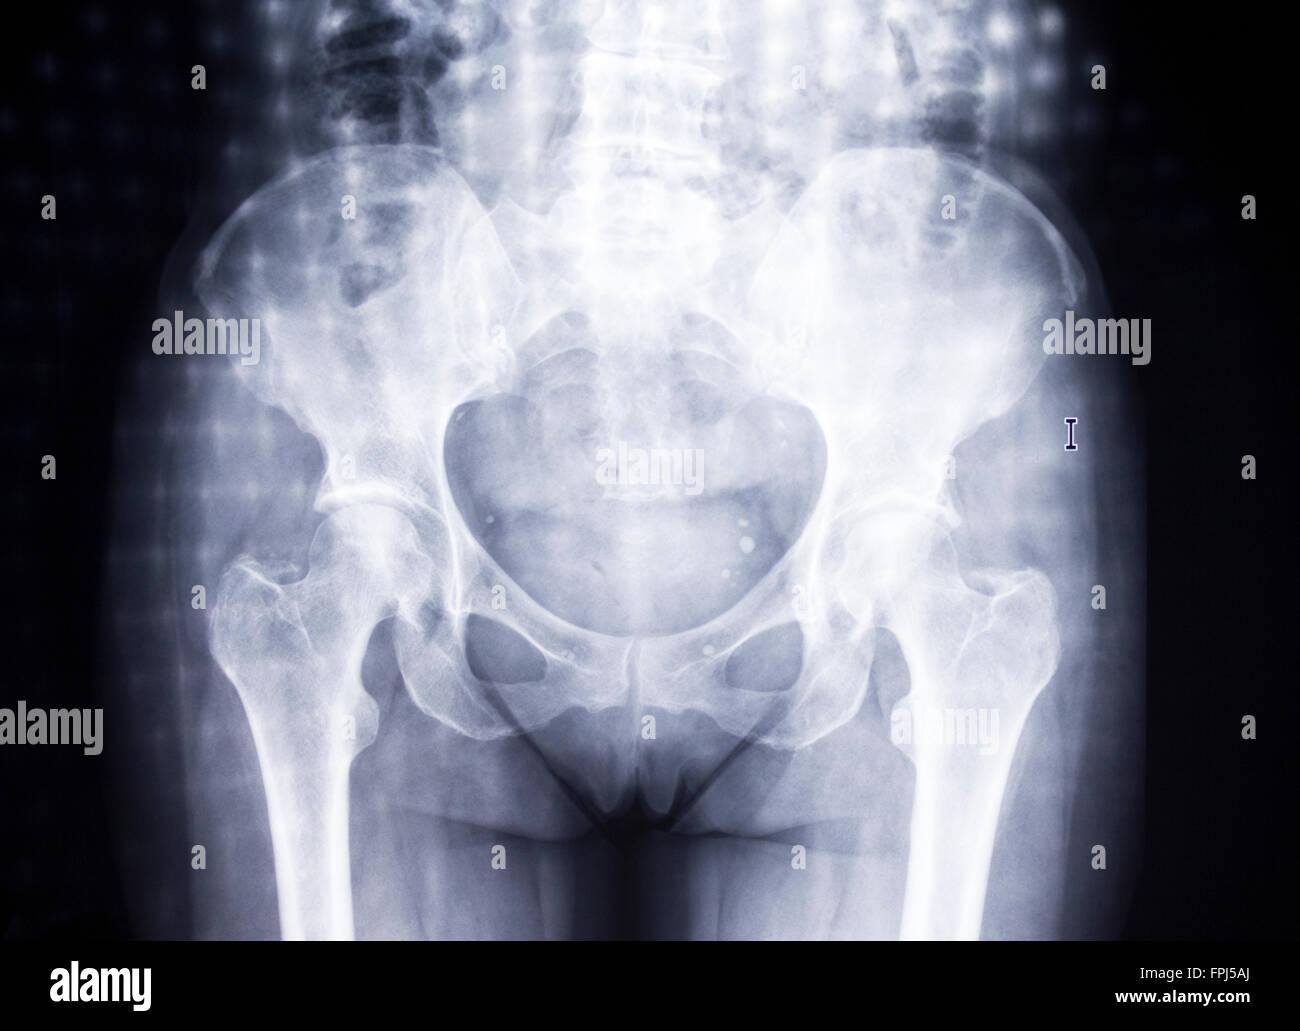 Bone scan. Woman's hips - Stock Image